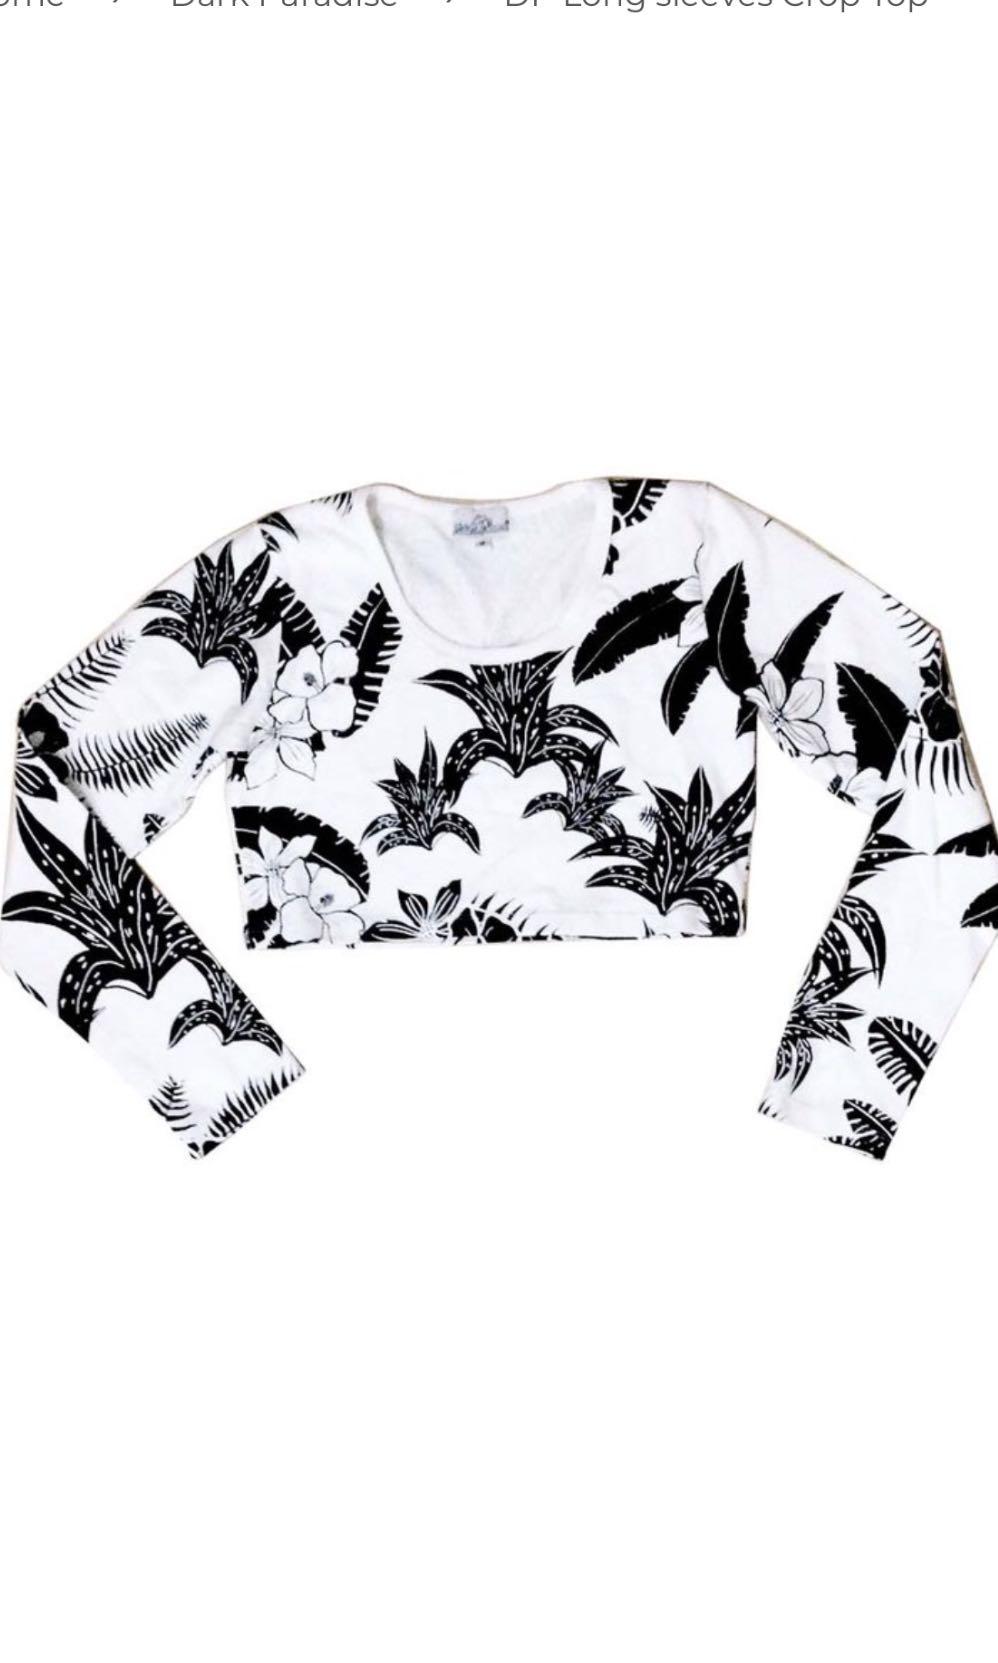 DP Long Sleeves - WHITE